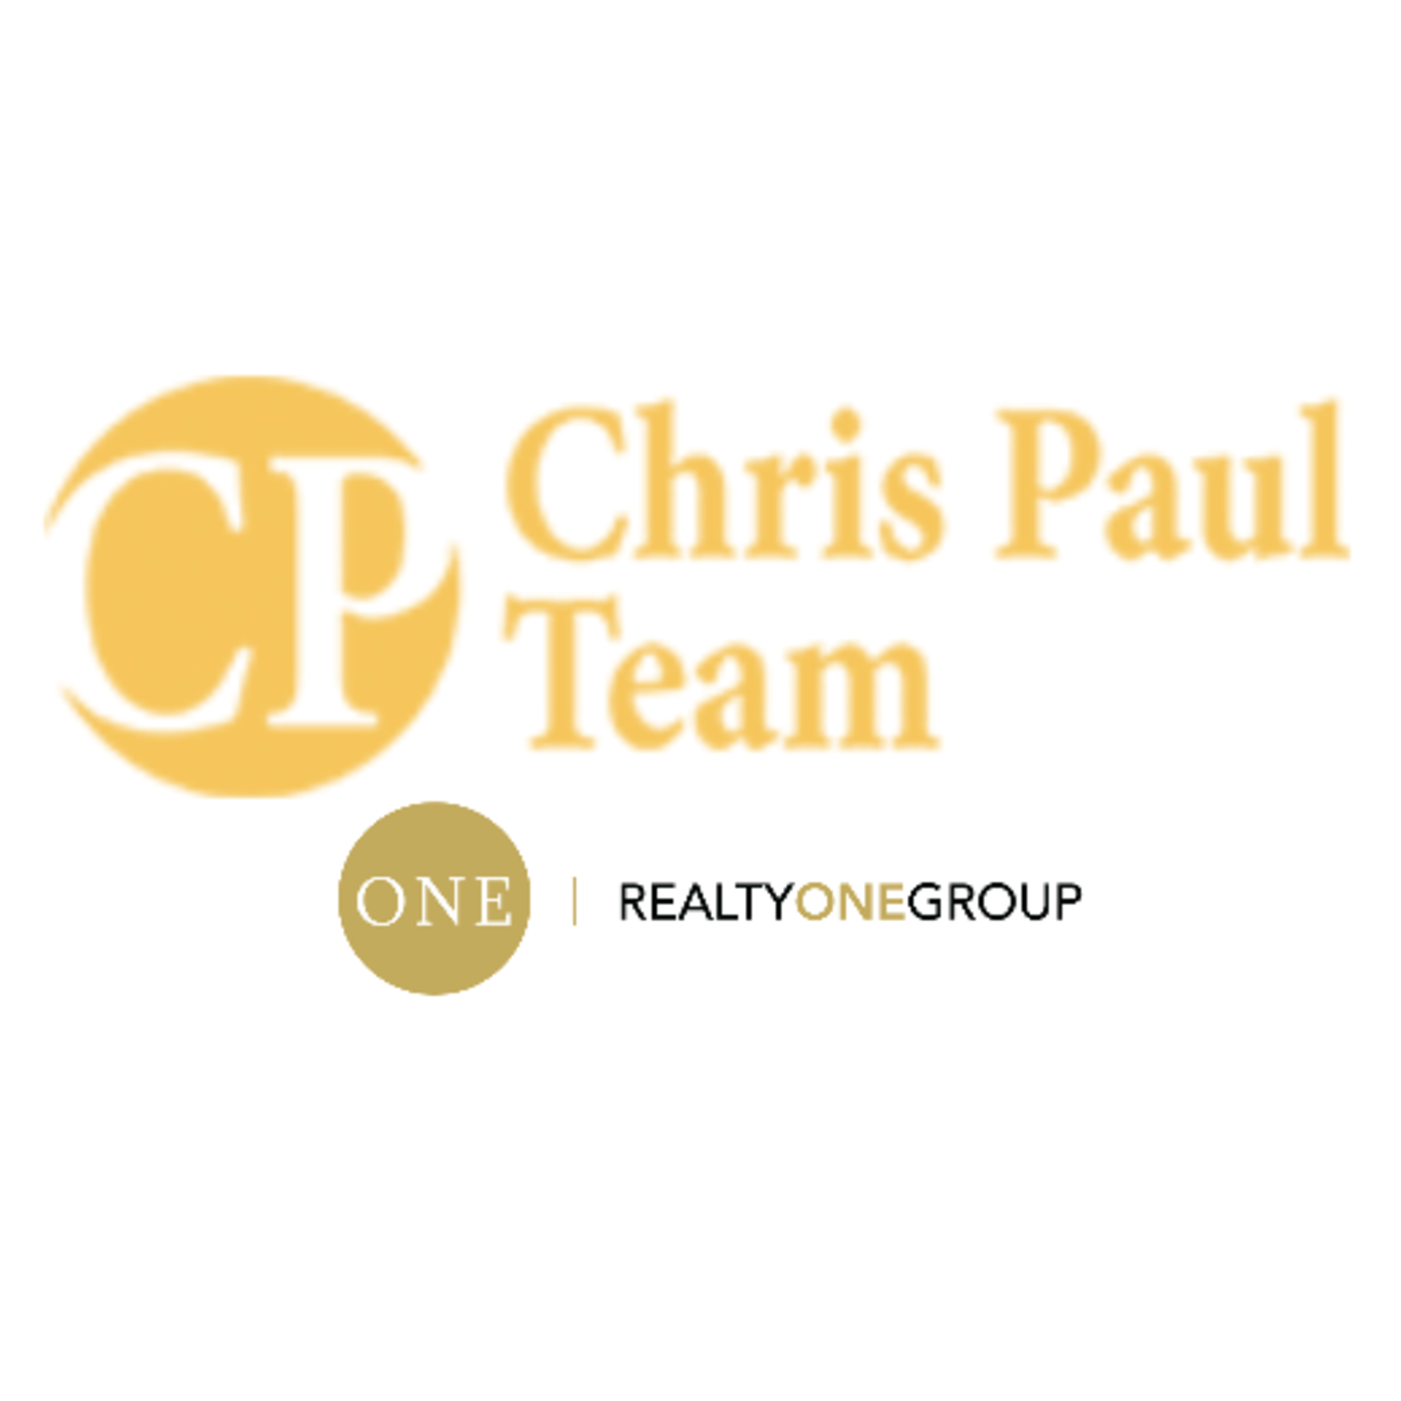 Chris Paul Team - Realty One Group